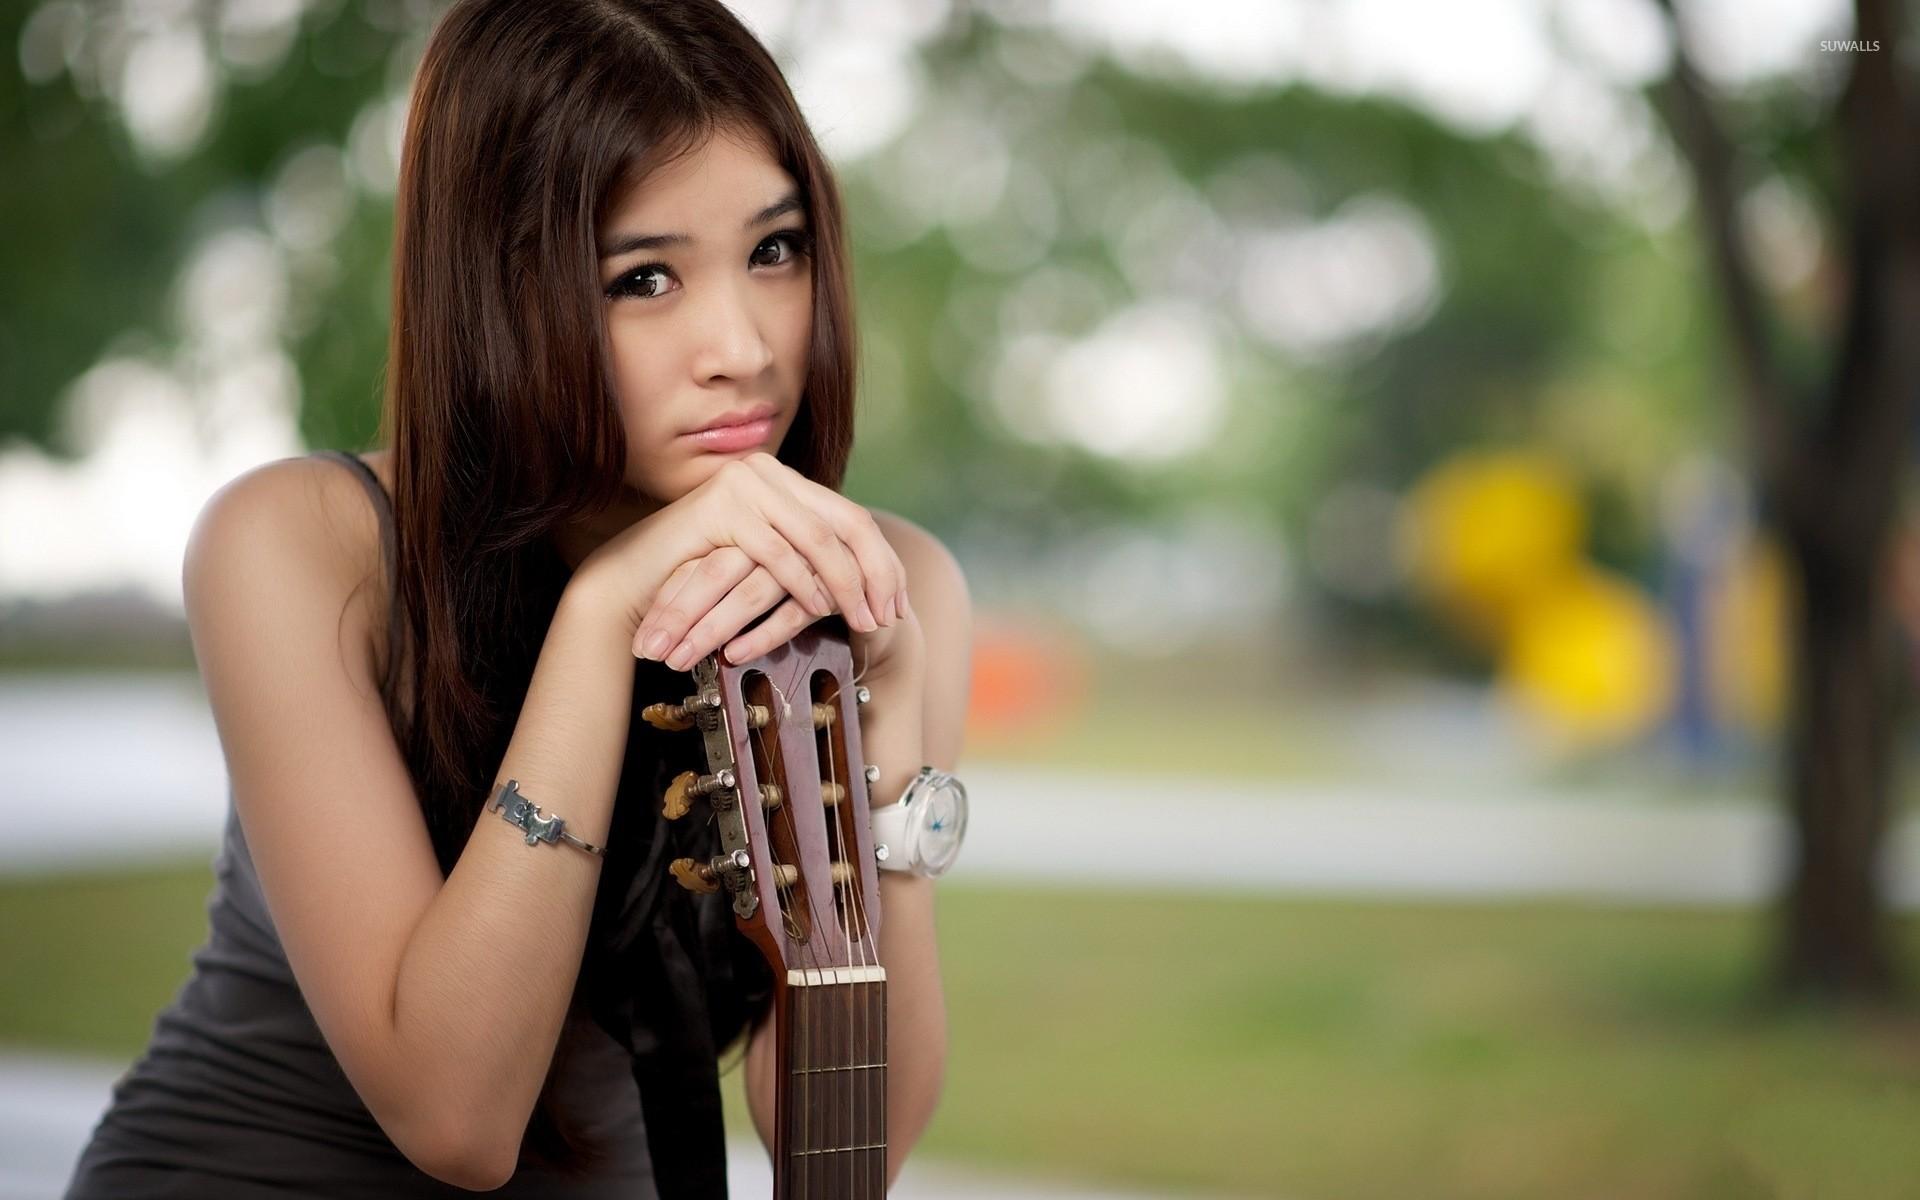 Res: 1920x1200, Sad asian girl with a guitar wallpaper